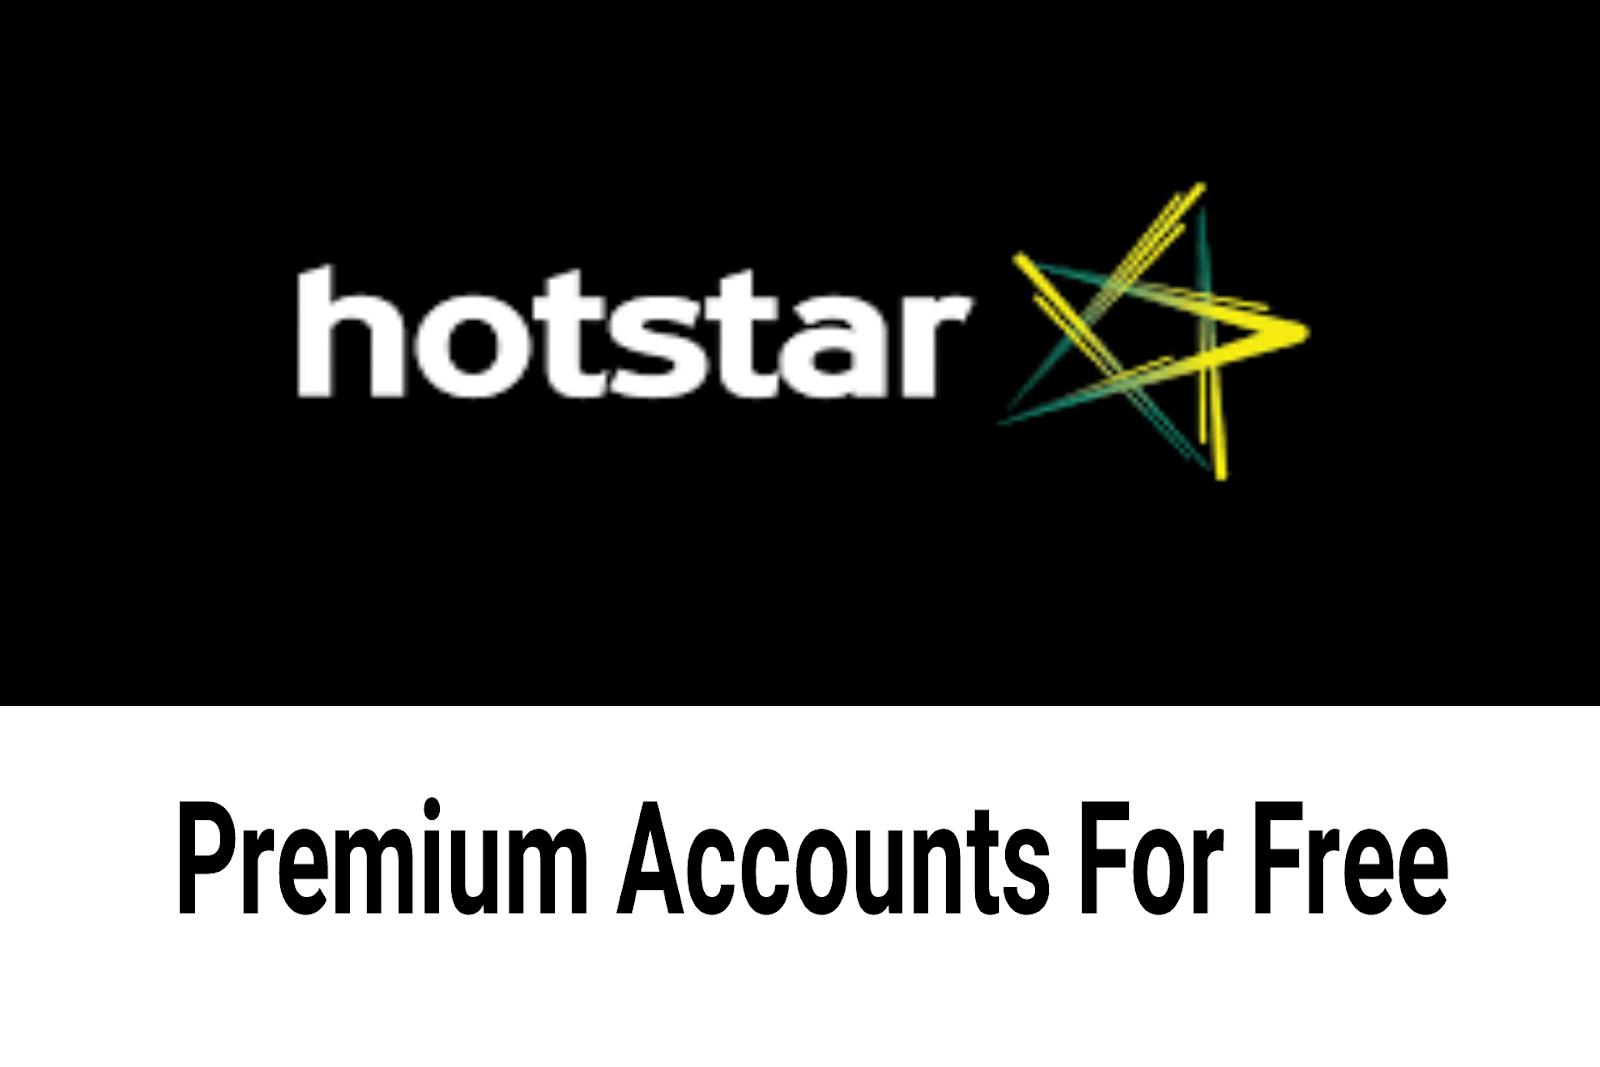 100% Working Hotstar Premium Accounts For Free -2019